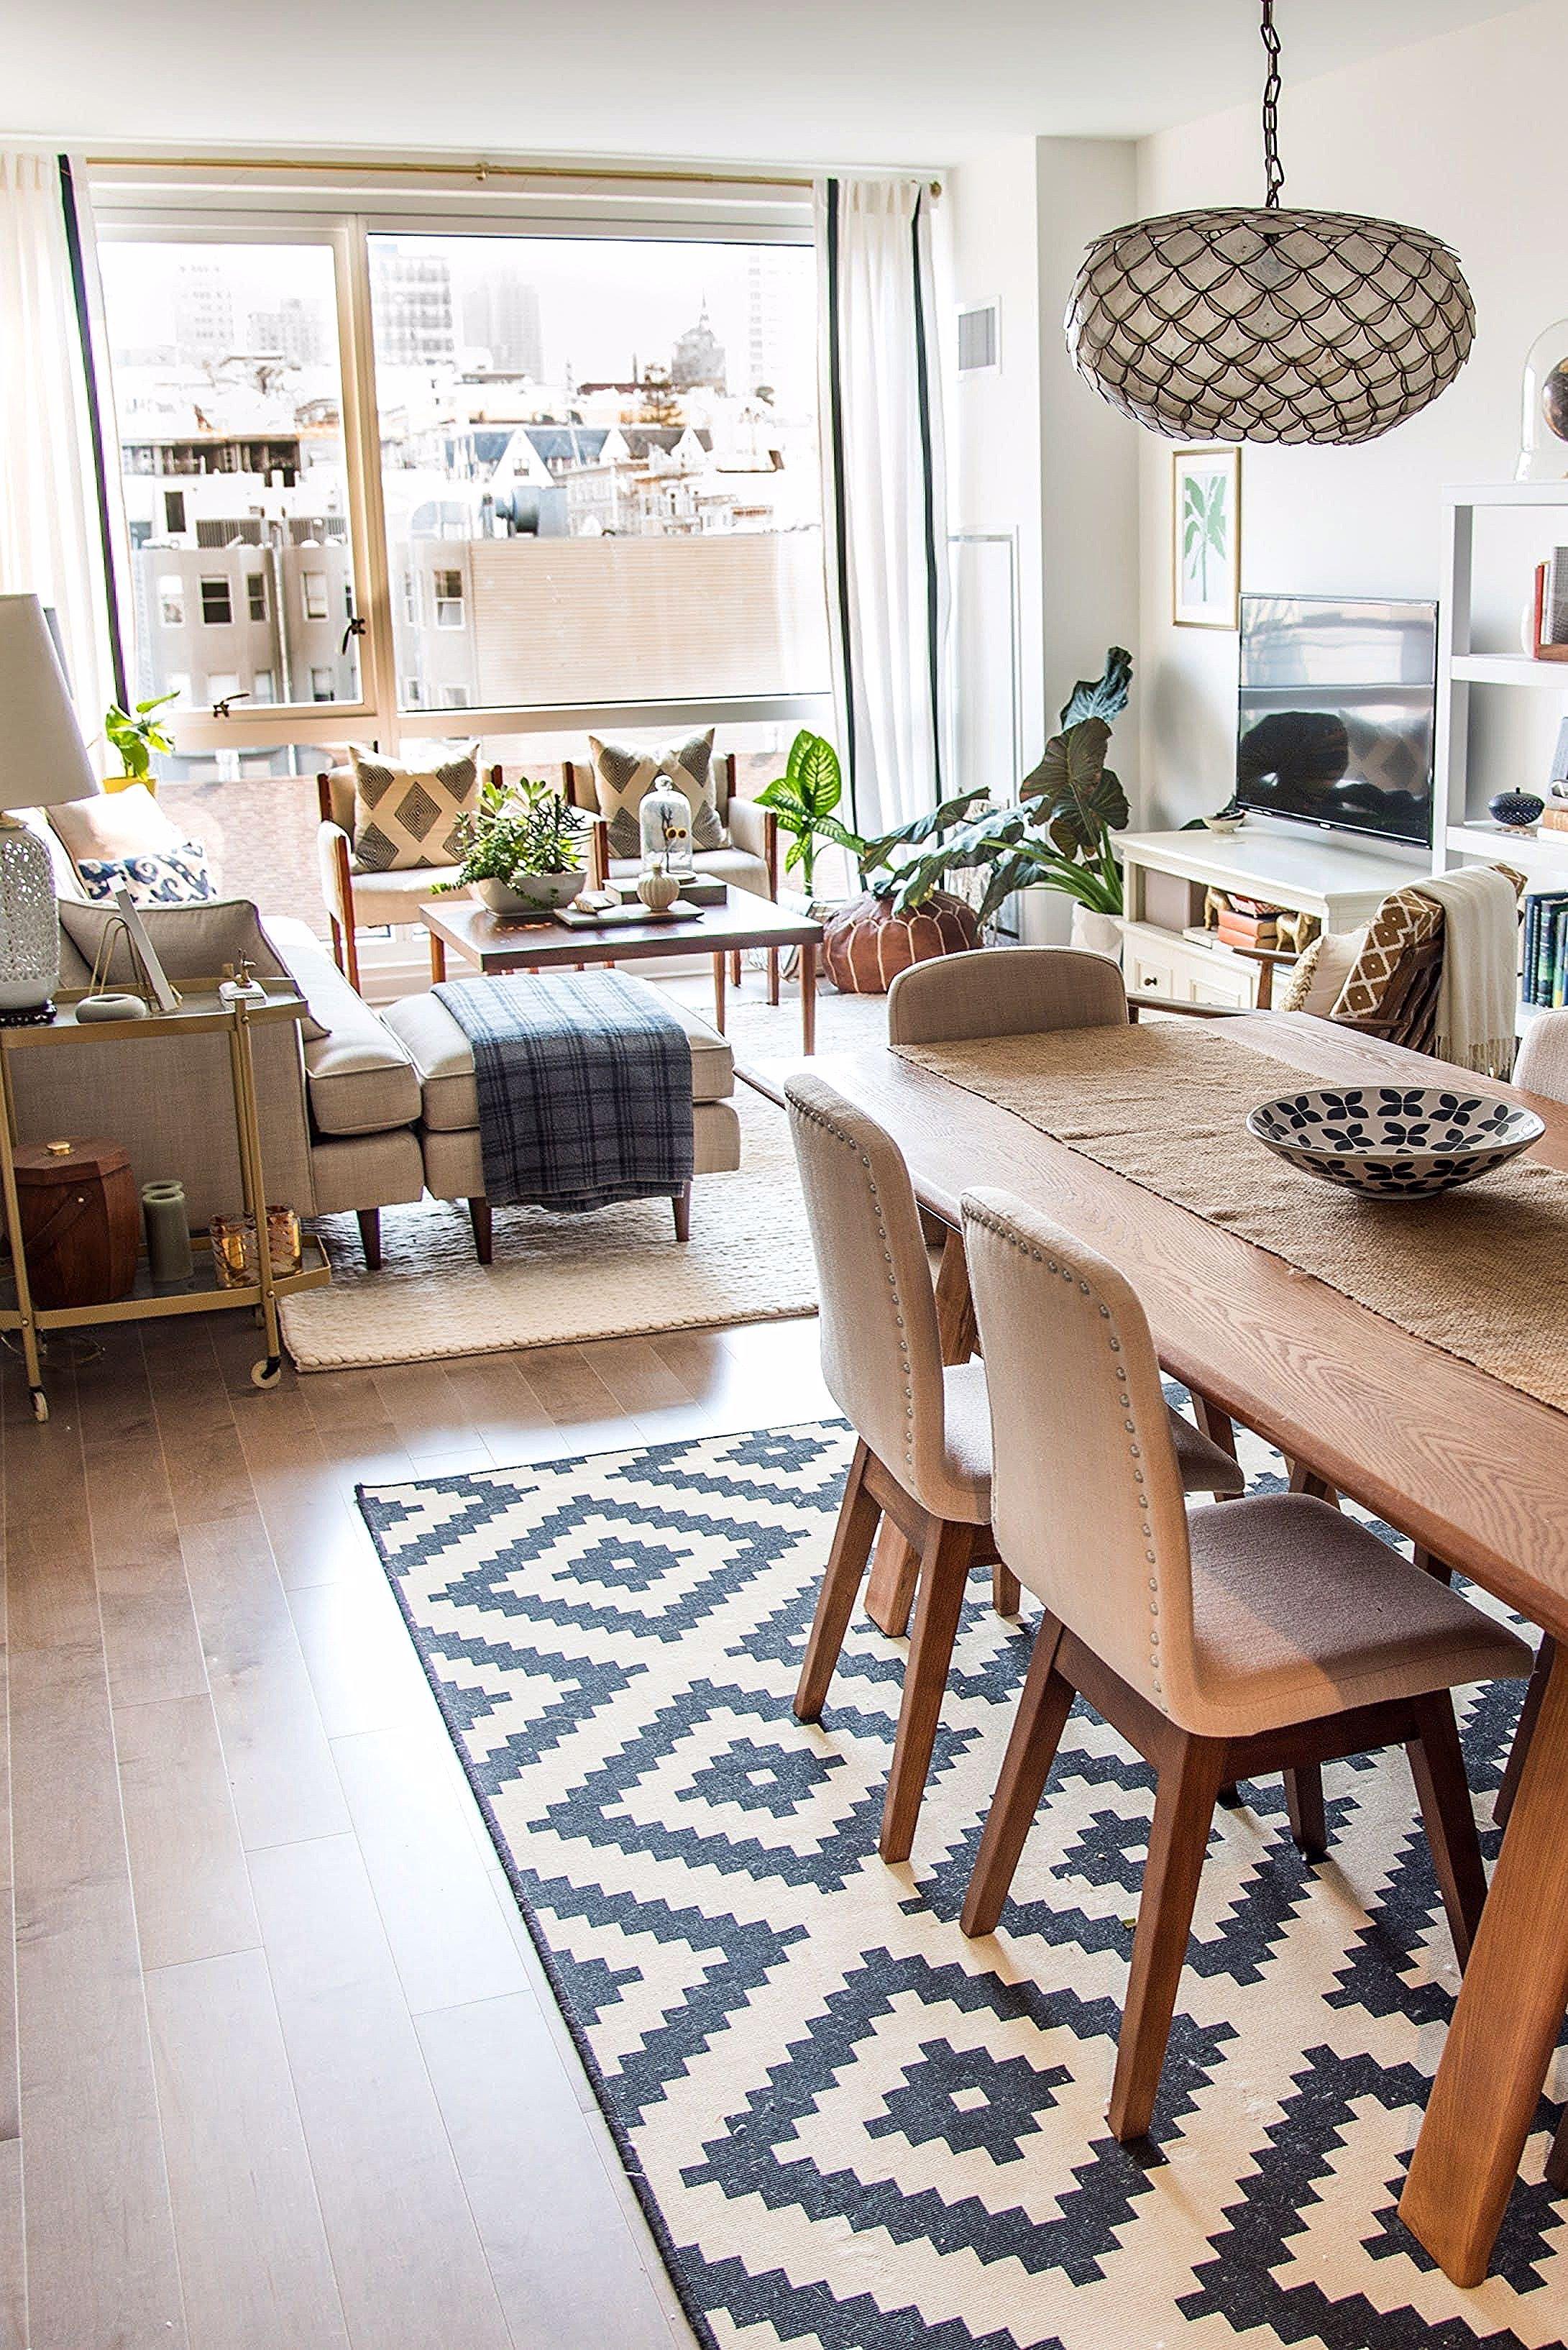 Dining Room Design In 2020 Modern Apartment Living Room Living Room Decor Apartment Apartment Living Room Design